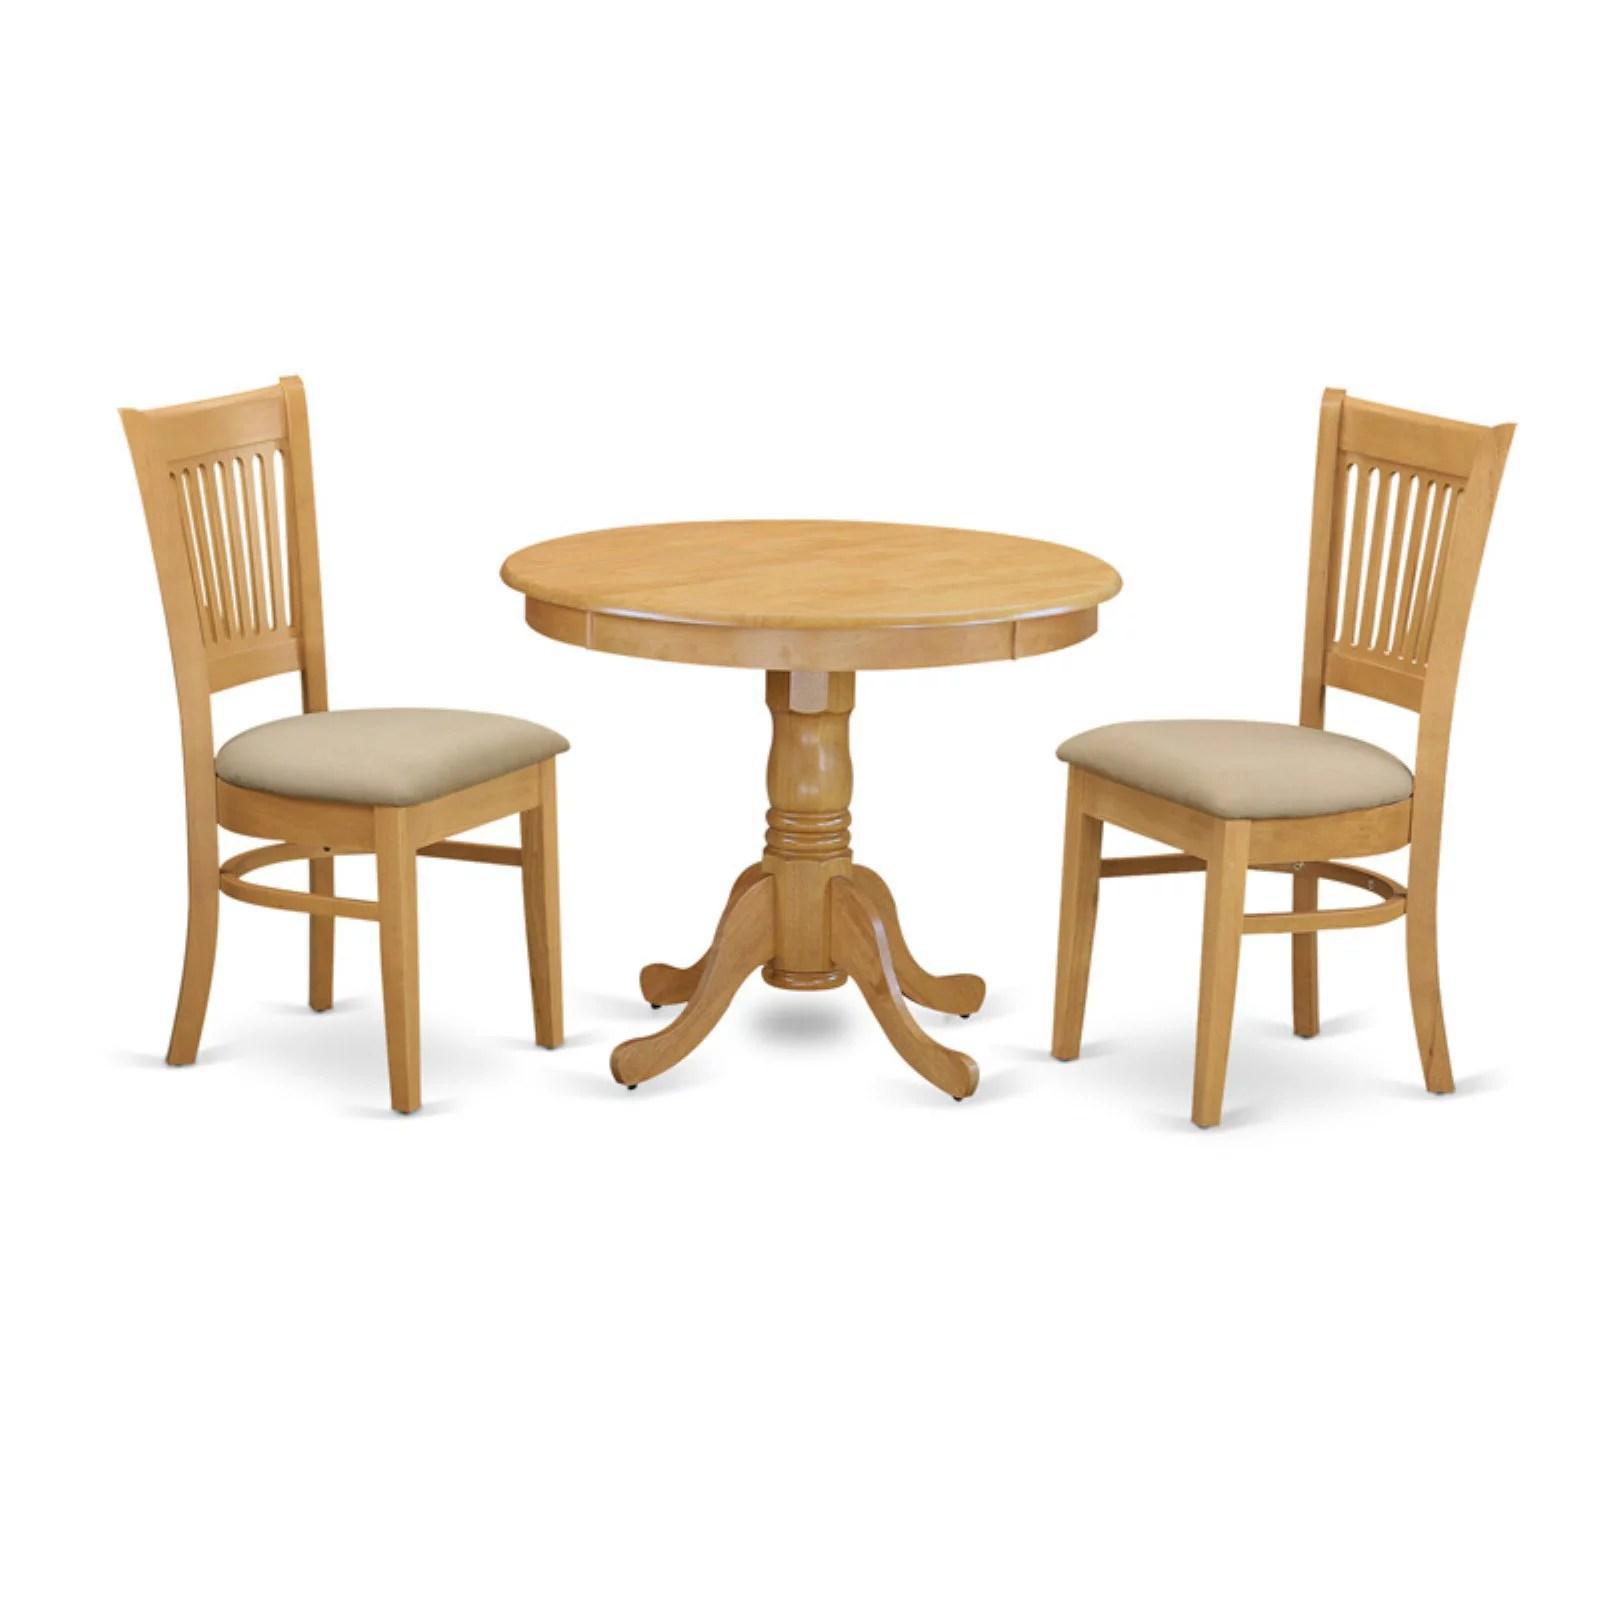 3 piece kitchen table black cabinet handles east west furniture hepplewhite modern